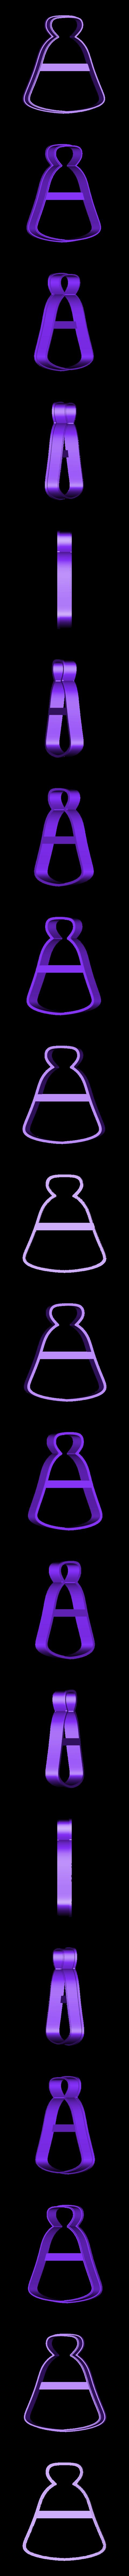 00974 butilochka zelie.obj Download OBJ file Bottle Potion cookie cutter for professional • 3D printer object, gleblubin